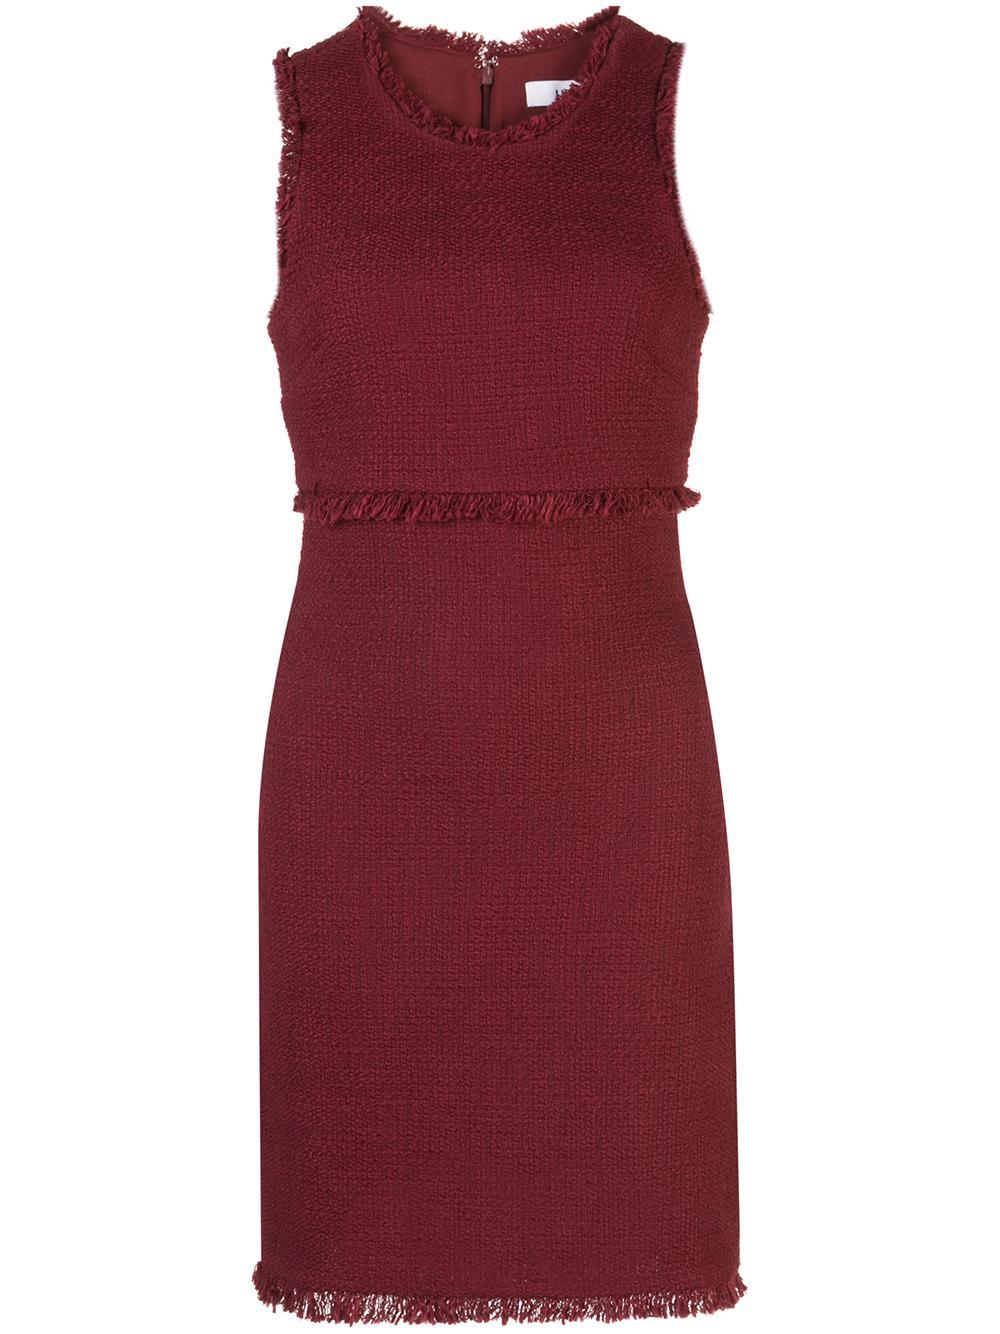 Palmira Tweed Dress